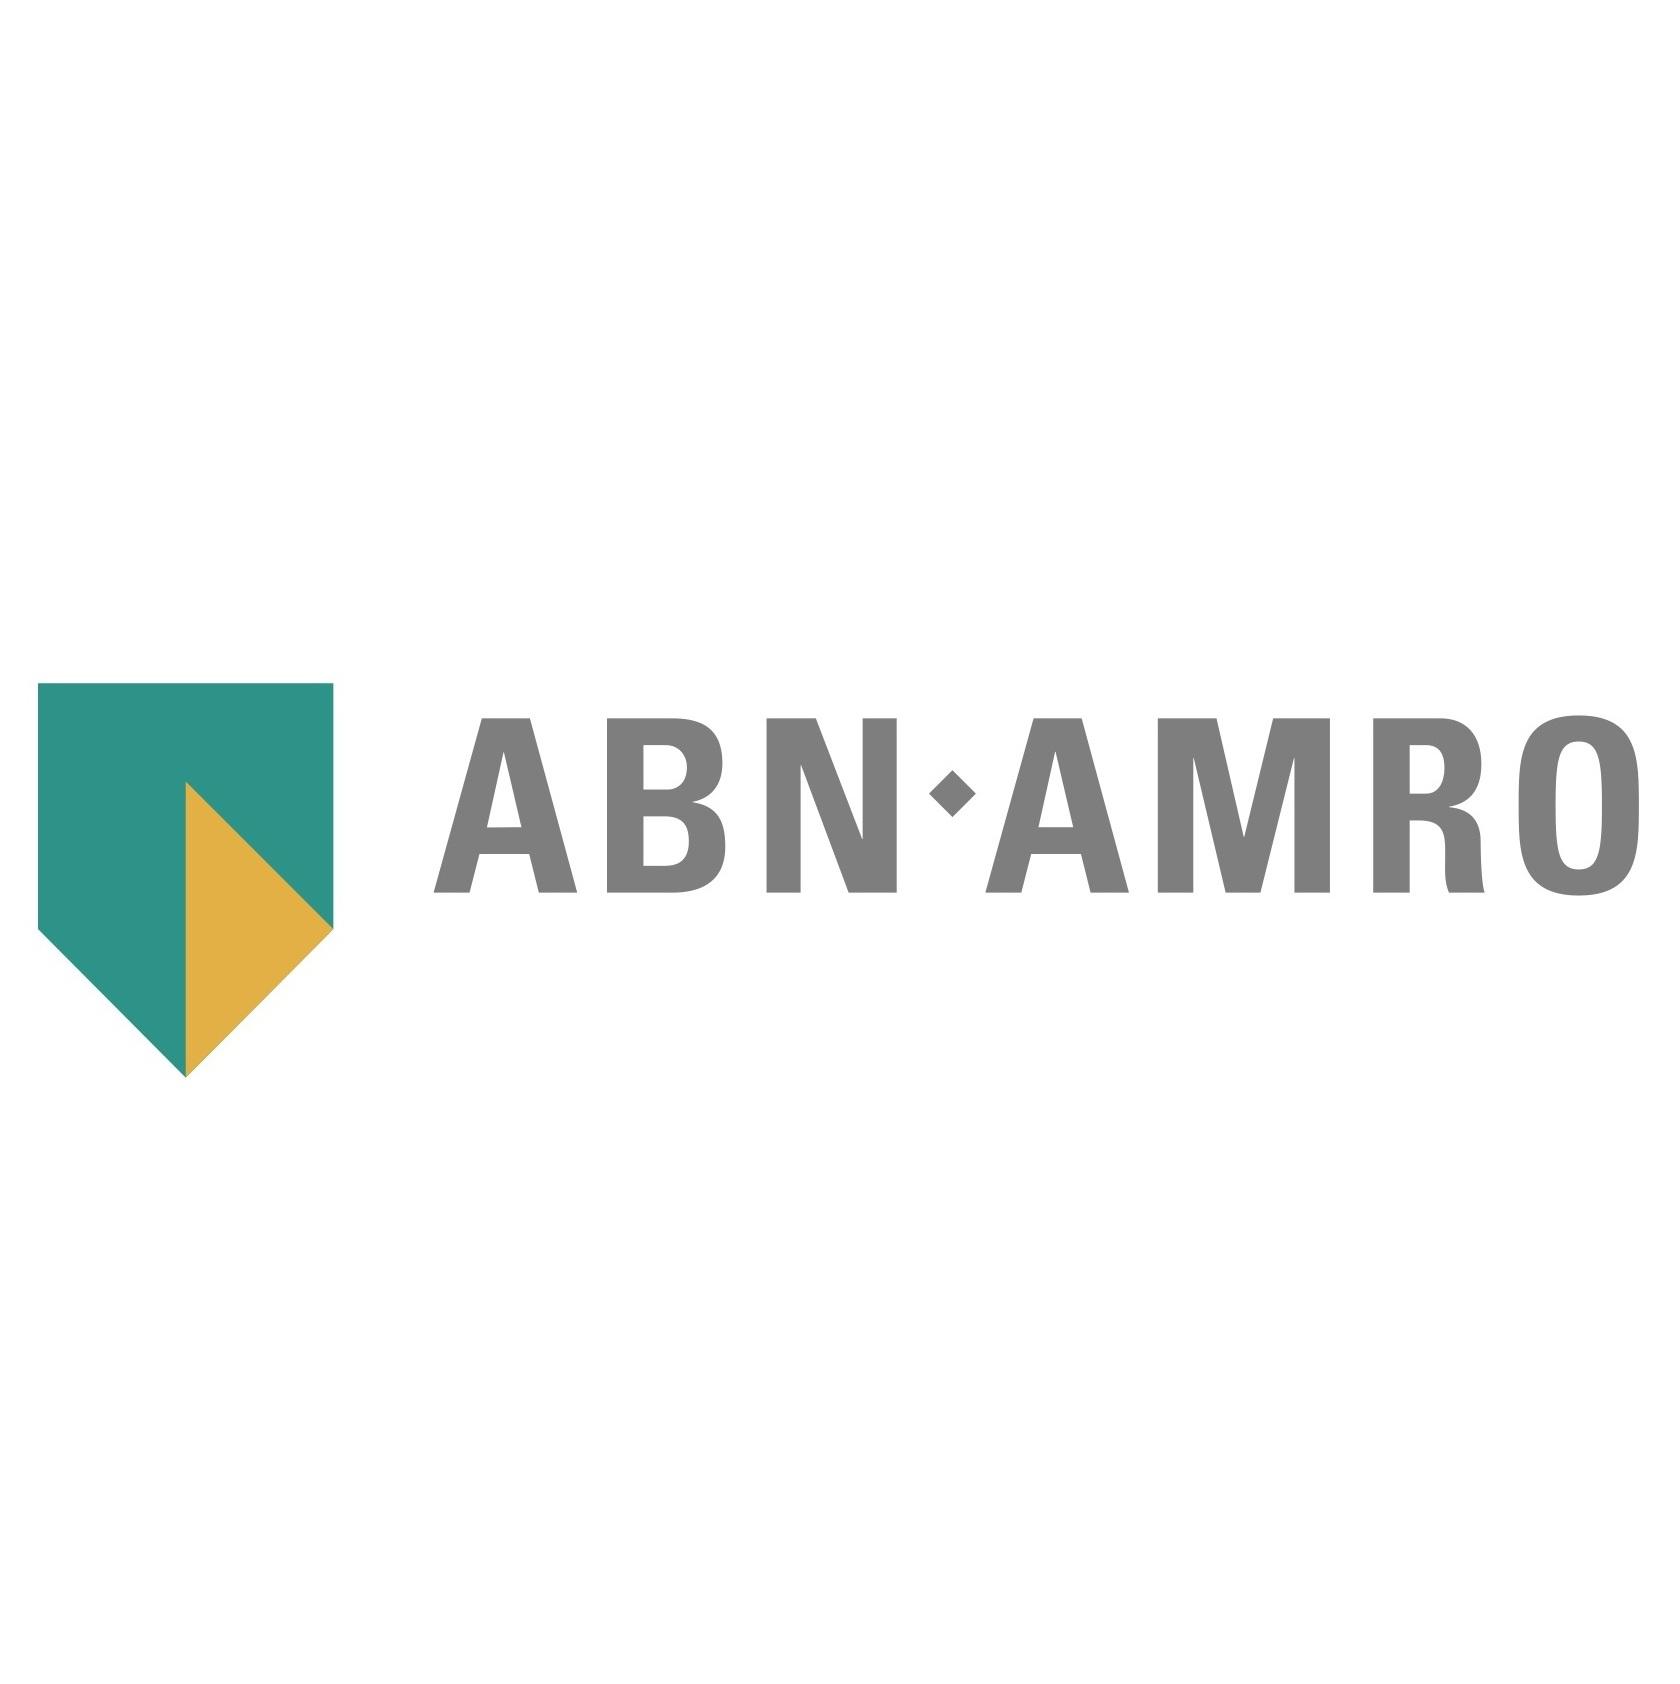 AbnAmro